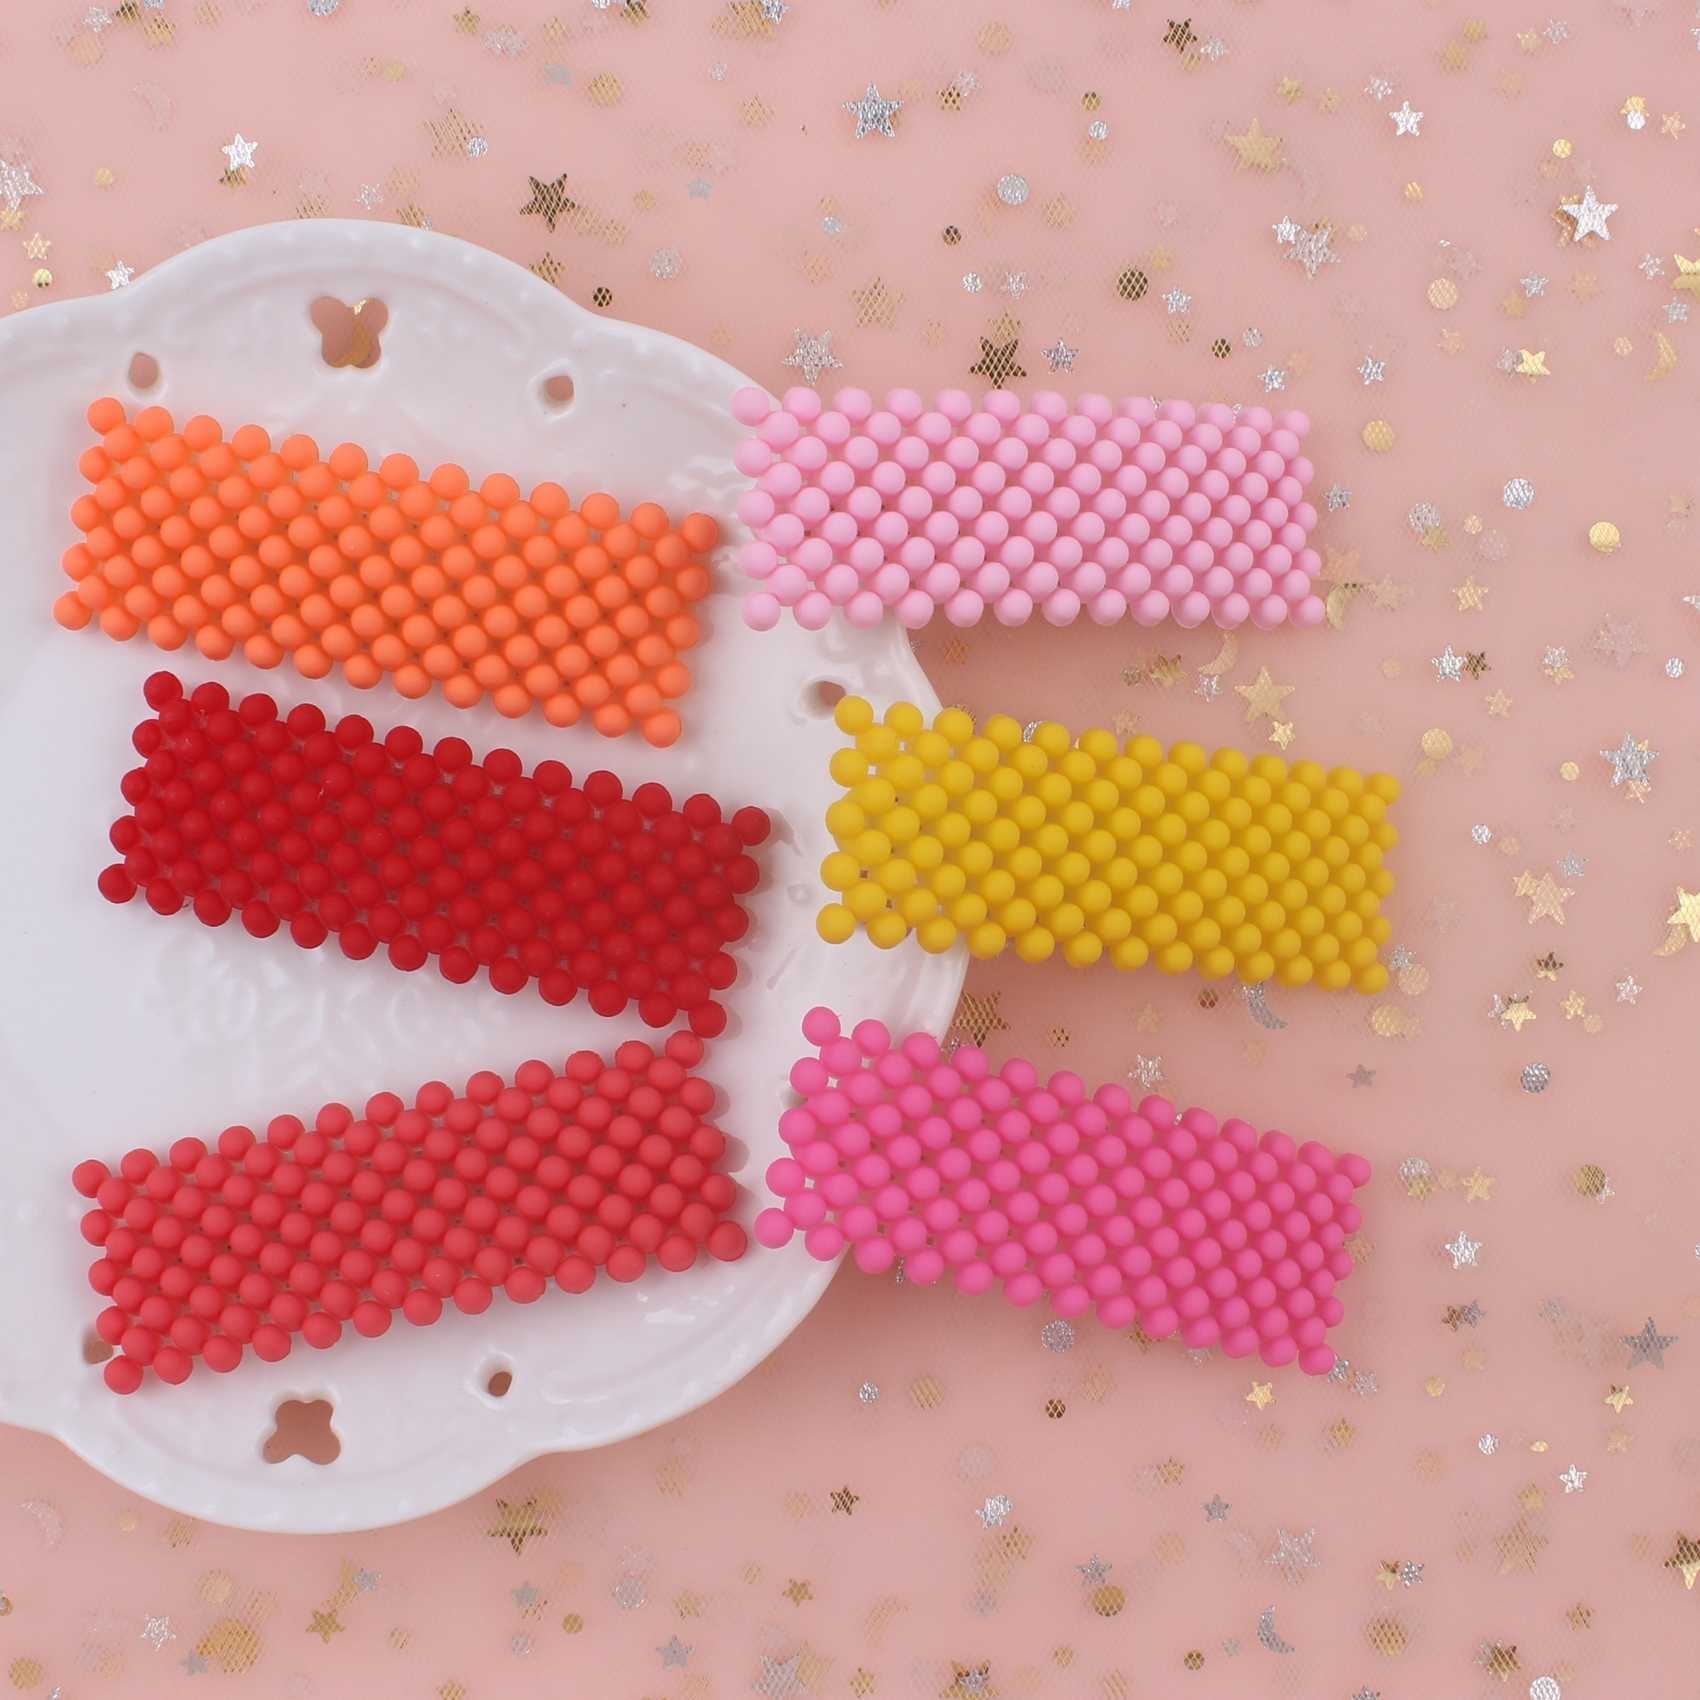 2019 NEW fashion geometric triangle small pink gray orange 6 colors pearl girls hair clips women barrettes b b long 75mm 1pcs